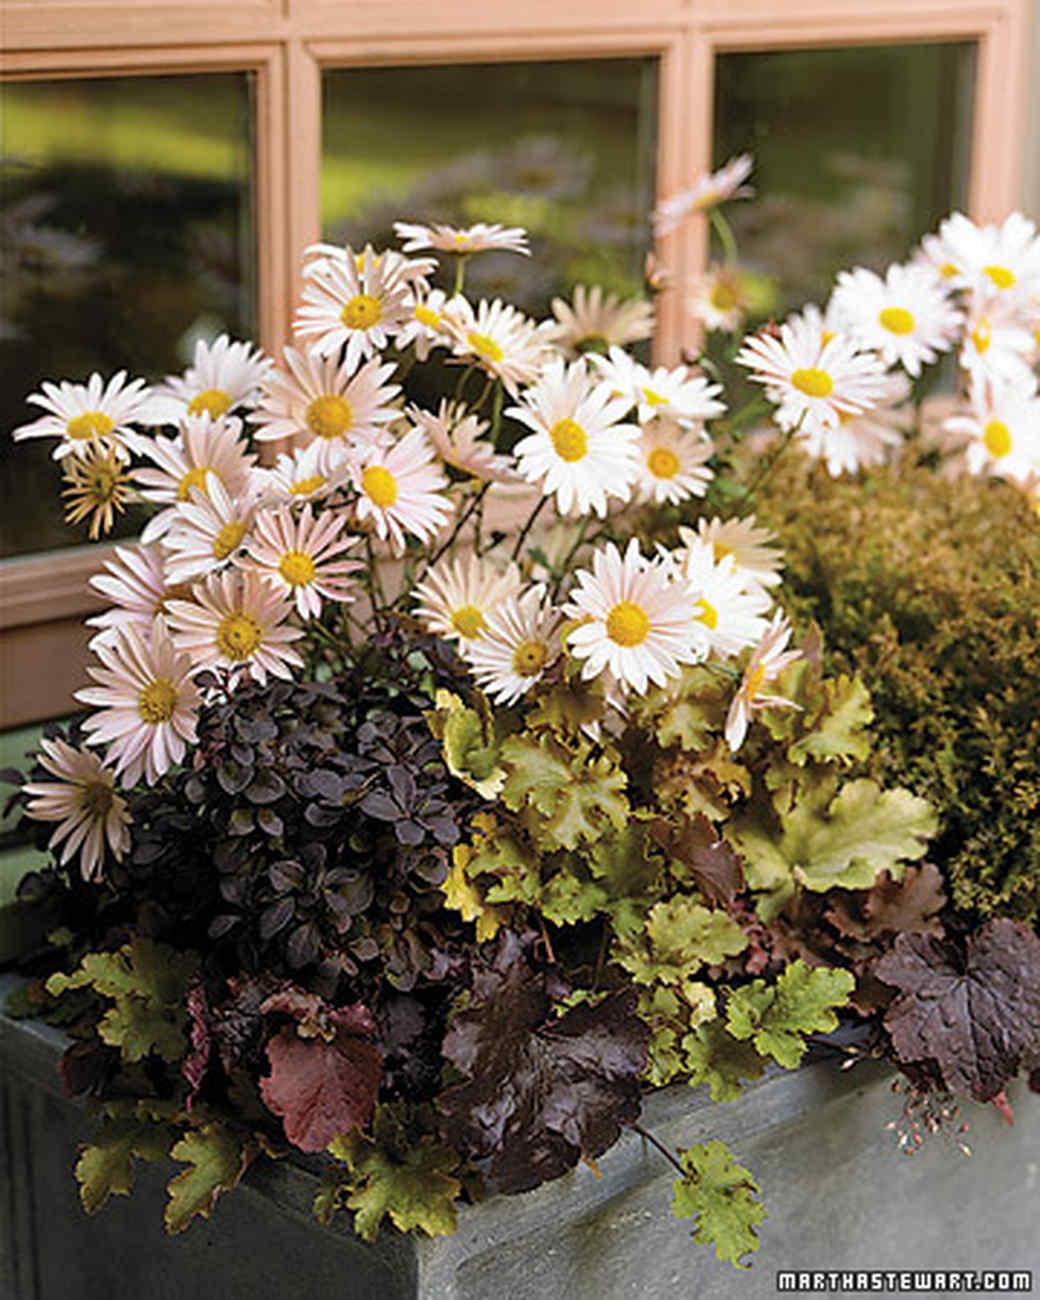 la101943_0906_chrysanth.jpg